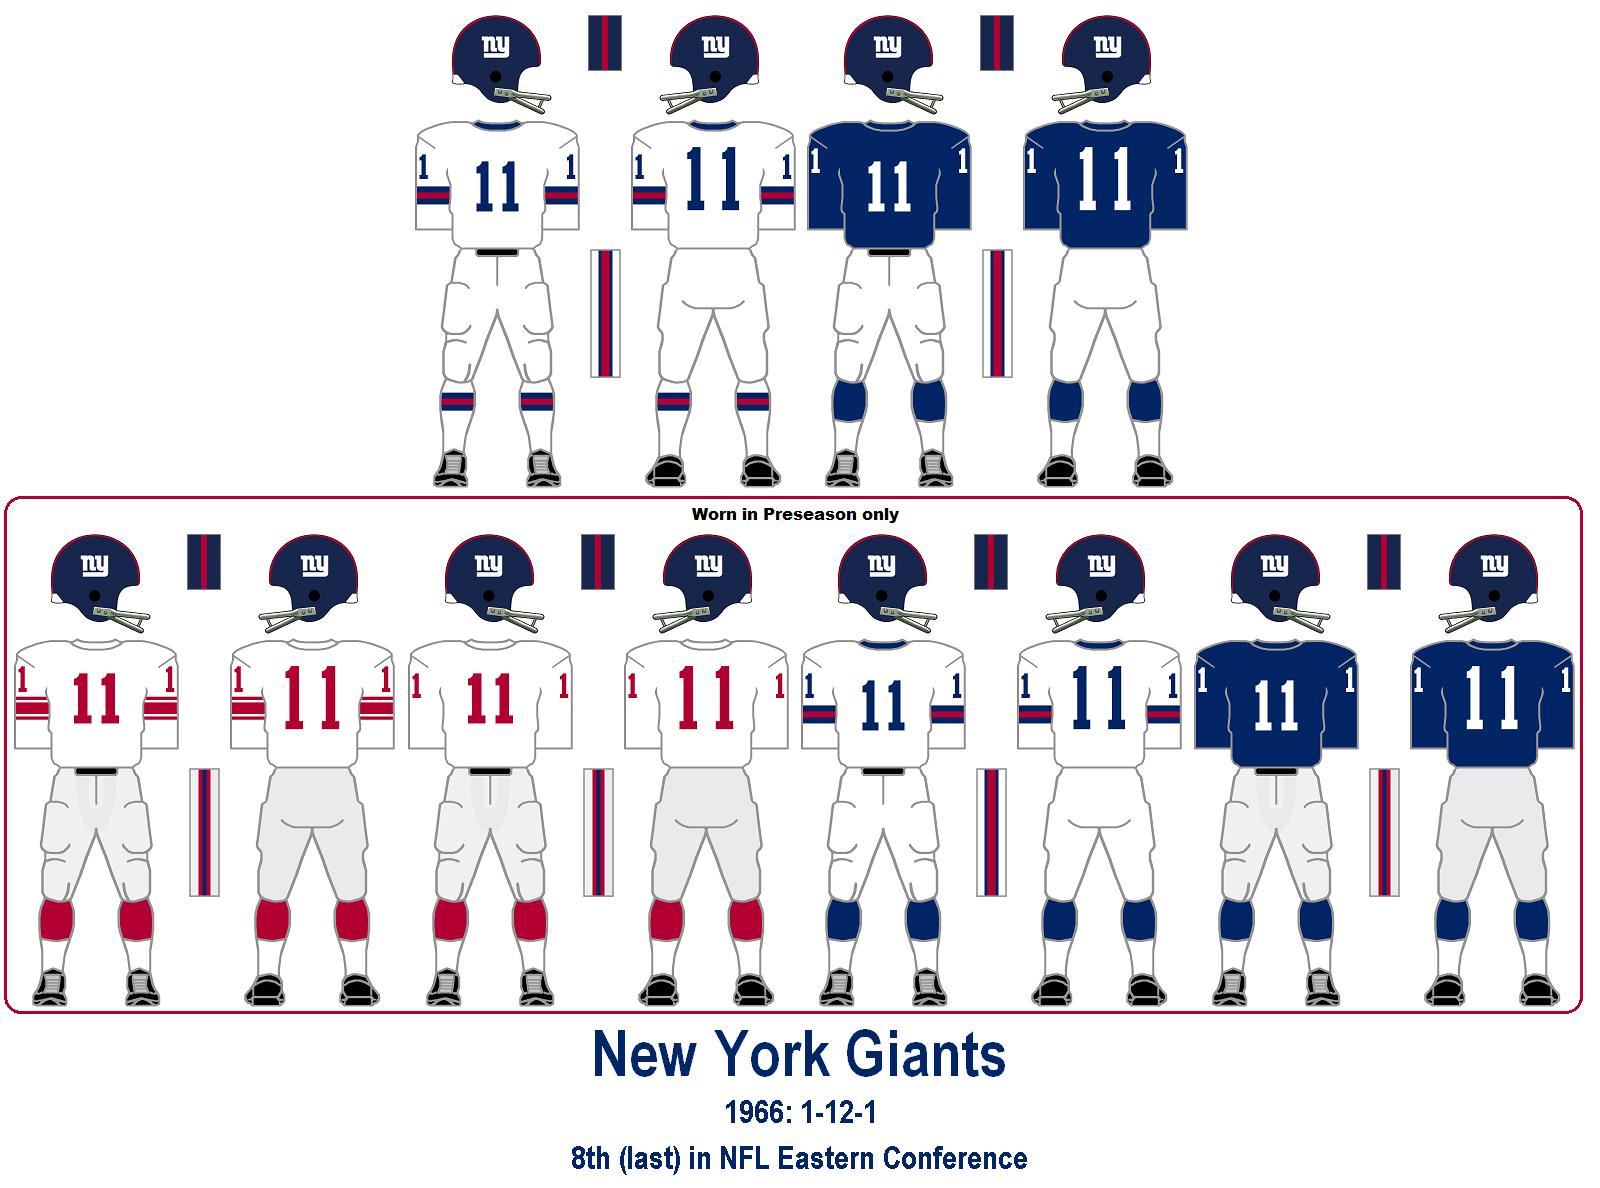 2017 NFL Uniform Analysis - Part 5 (The Great) : nfl